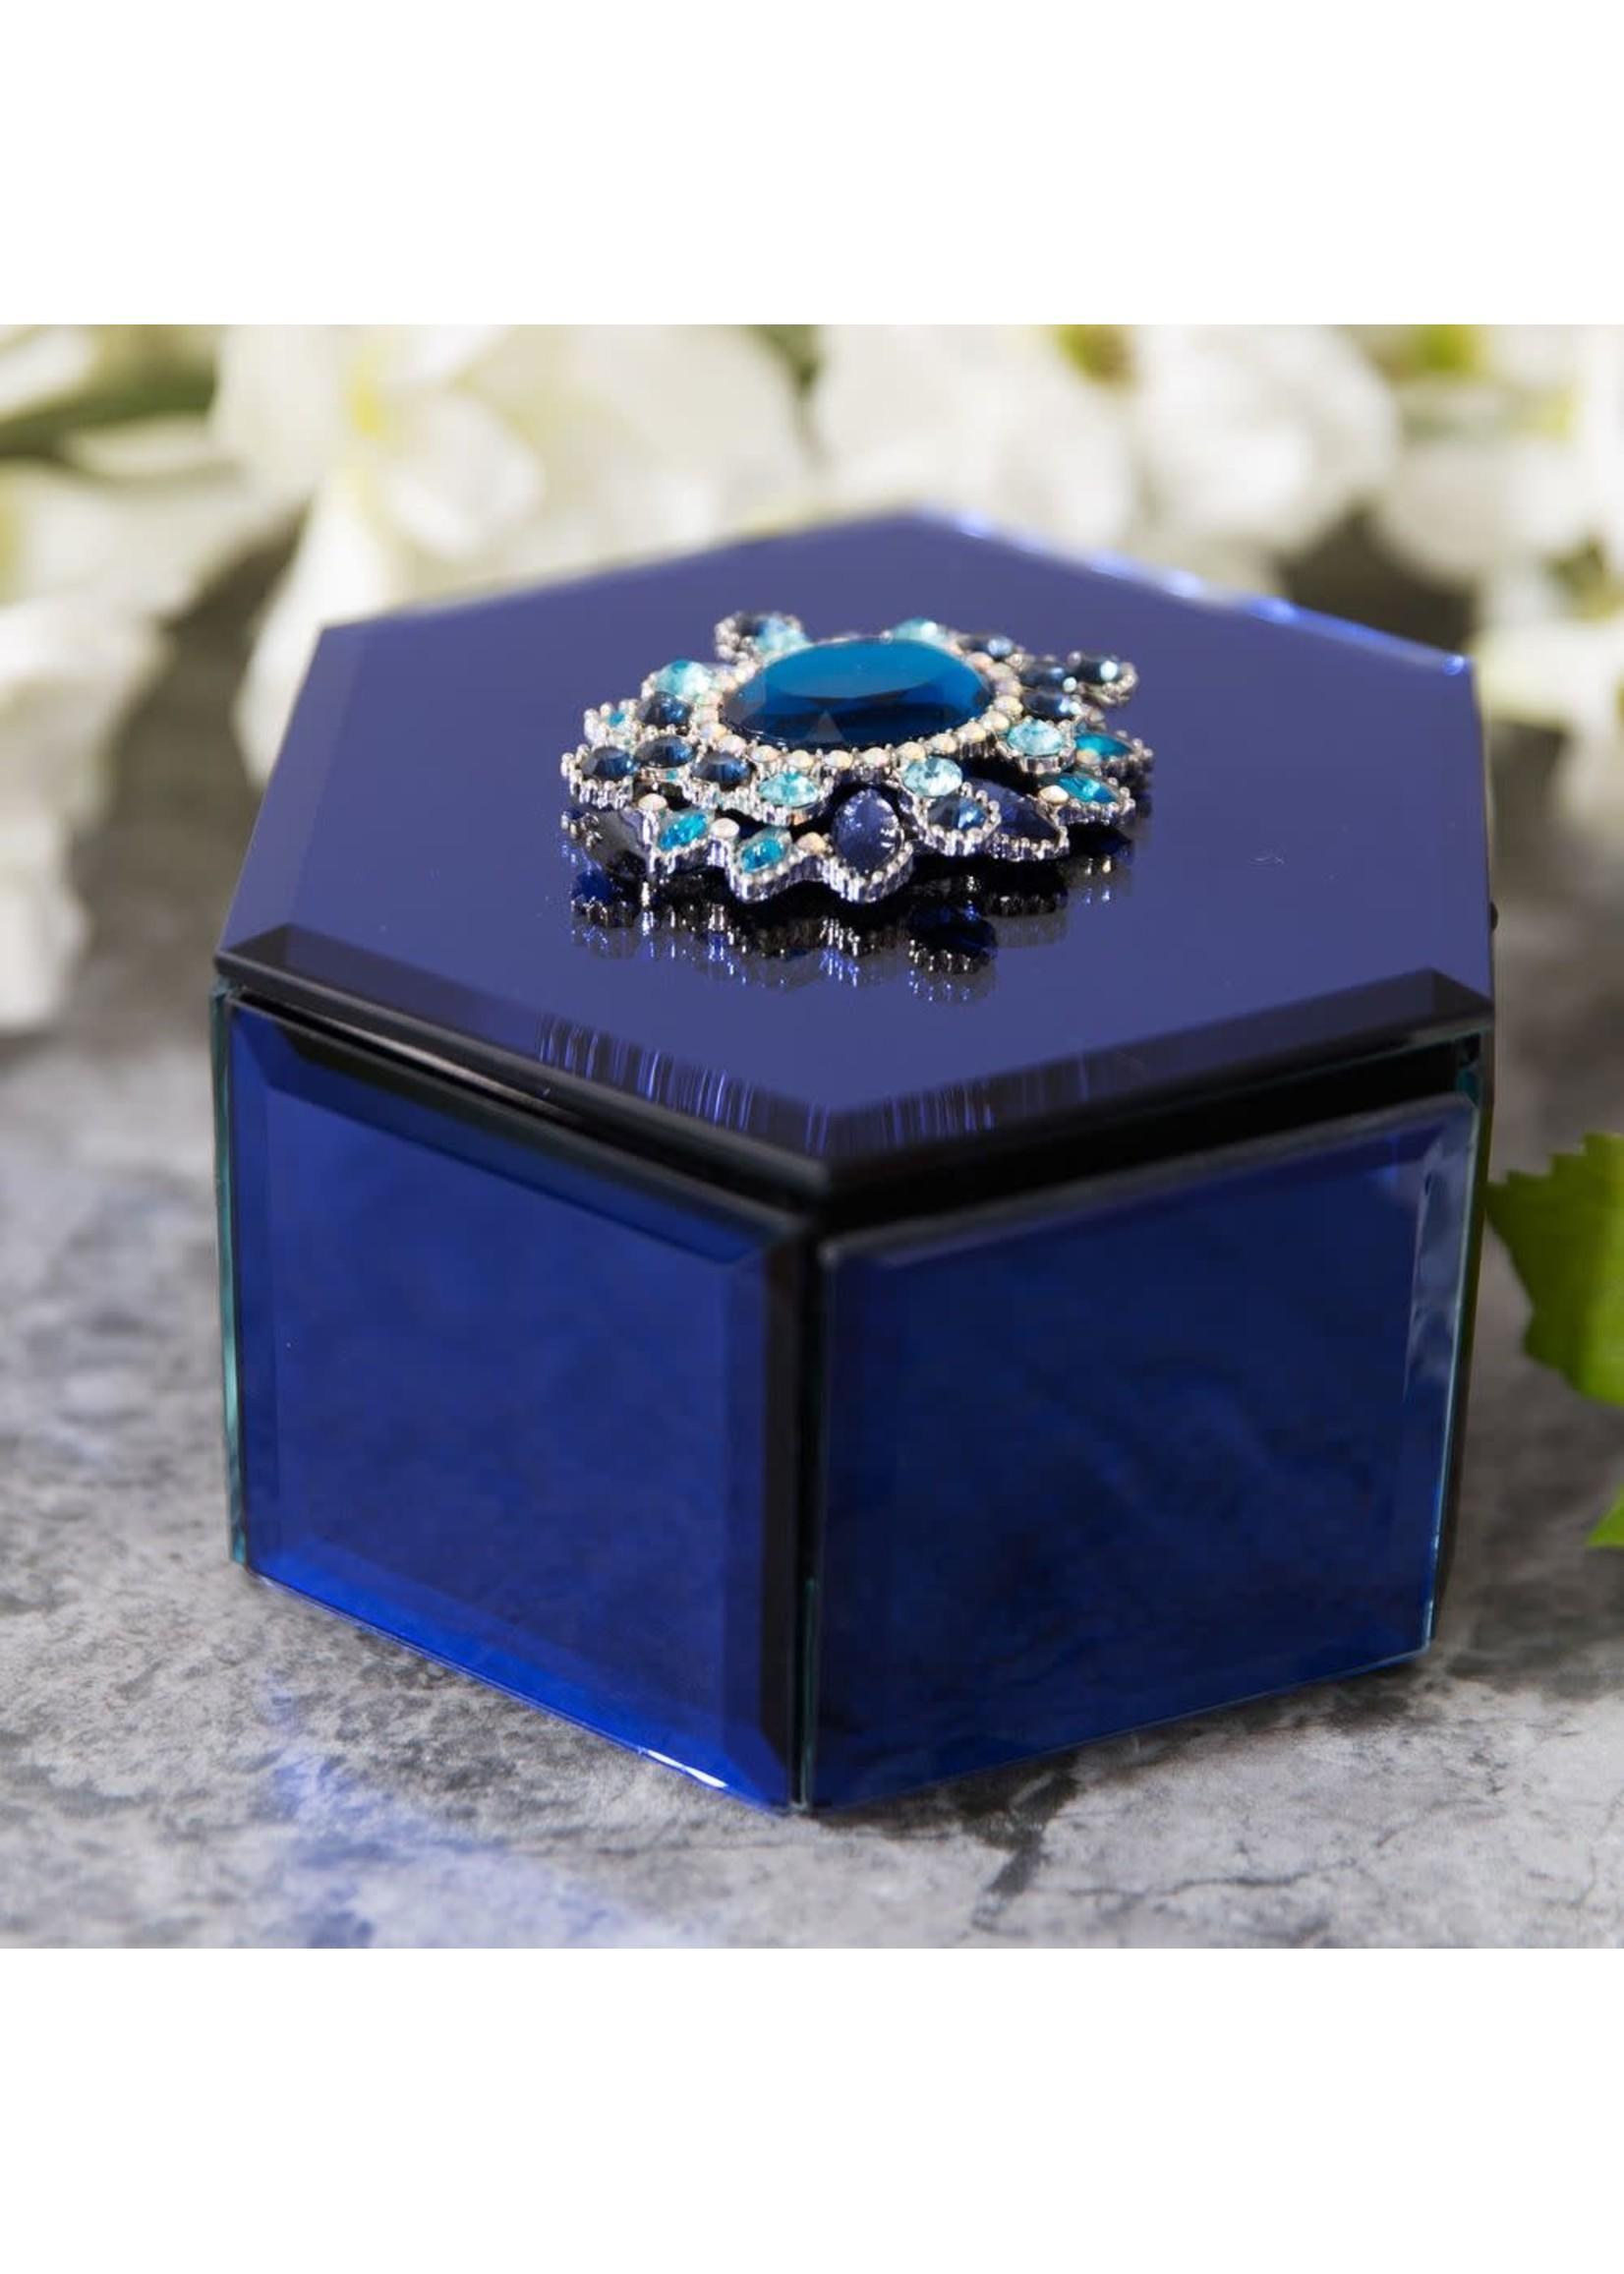 SOPHIA HEXAGONAL BLUE GLASS TRINKET BOX CRYSTAL FLOWERS